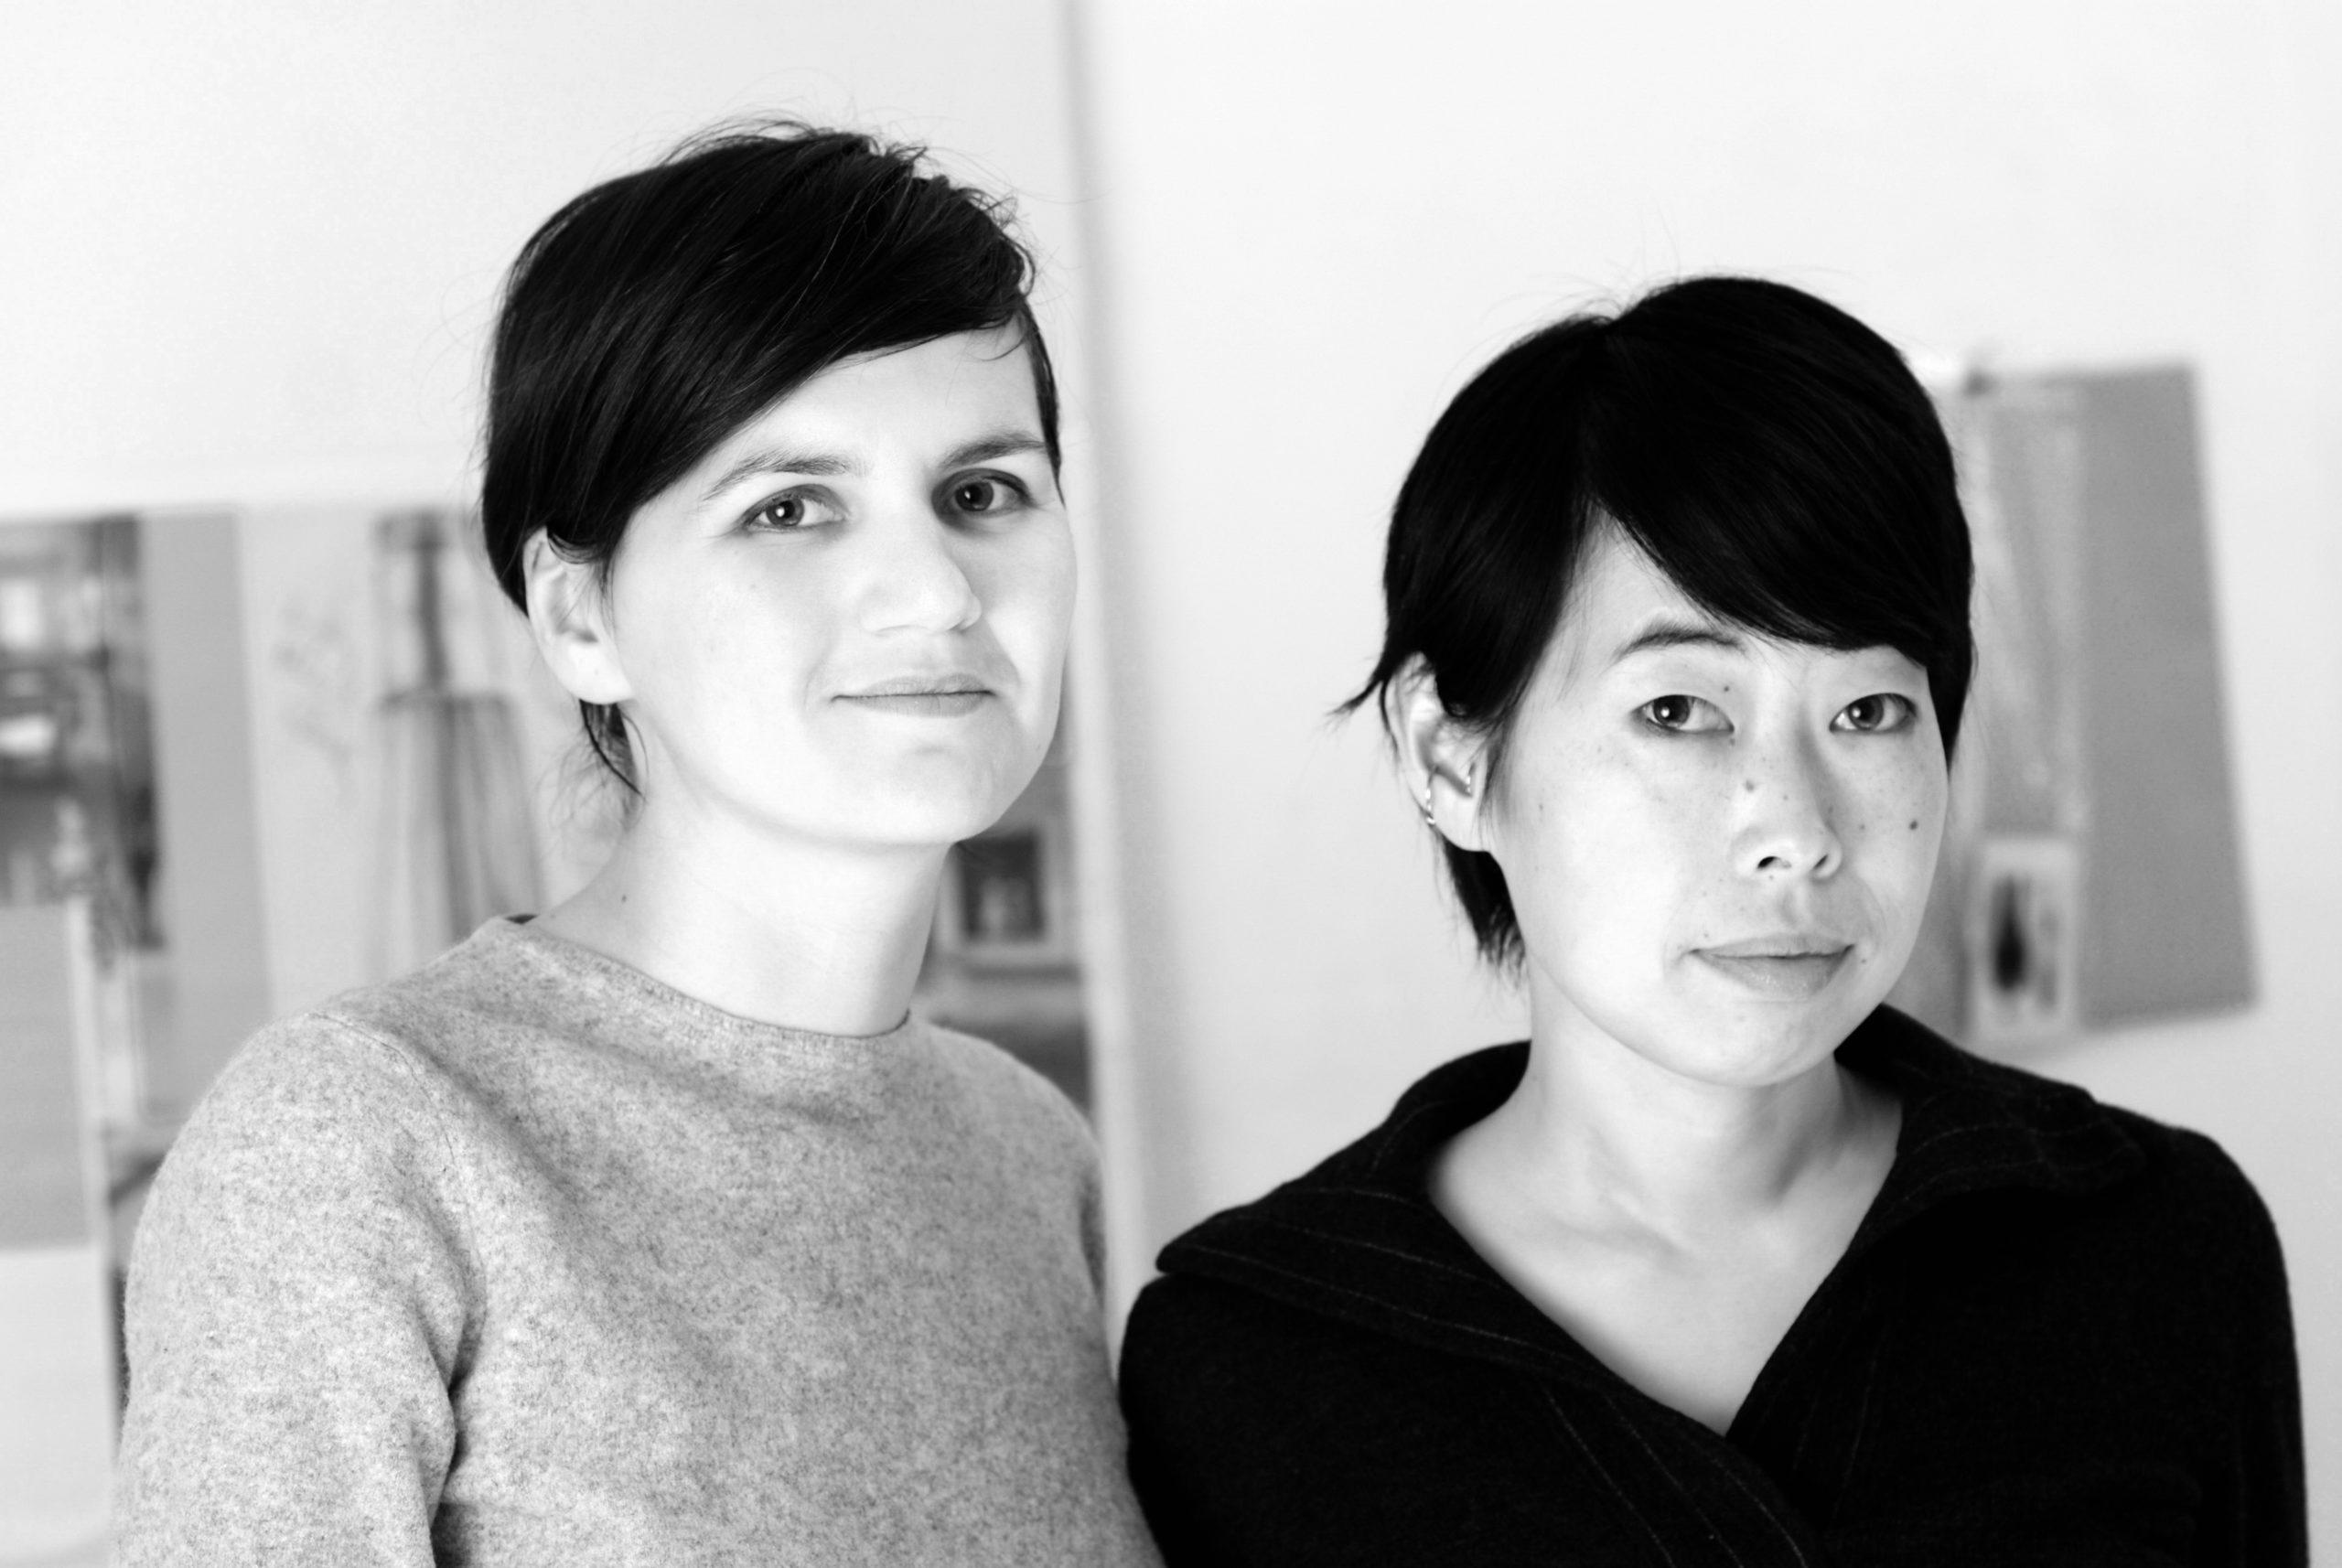 Schmidt Takahashi, Mode, Berlin, 030 Magazin